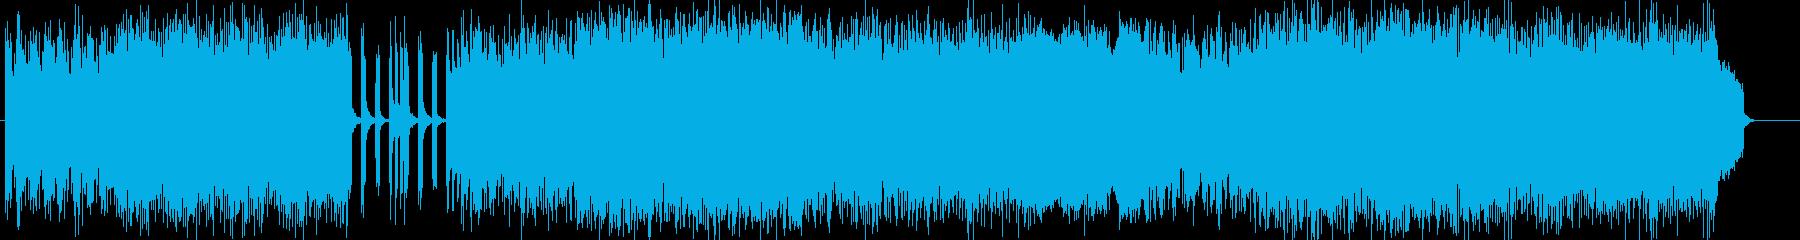 「POWER・HEAVYMETAL」の再生済みの波形